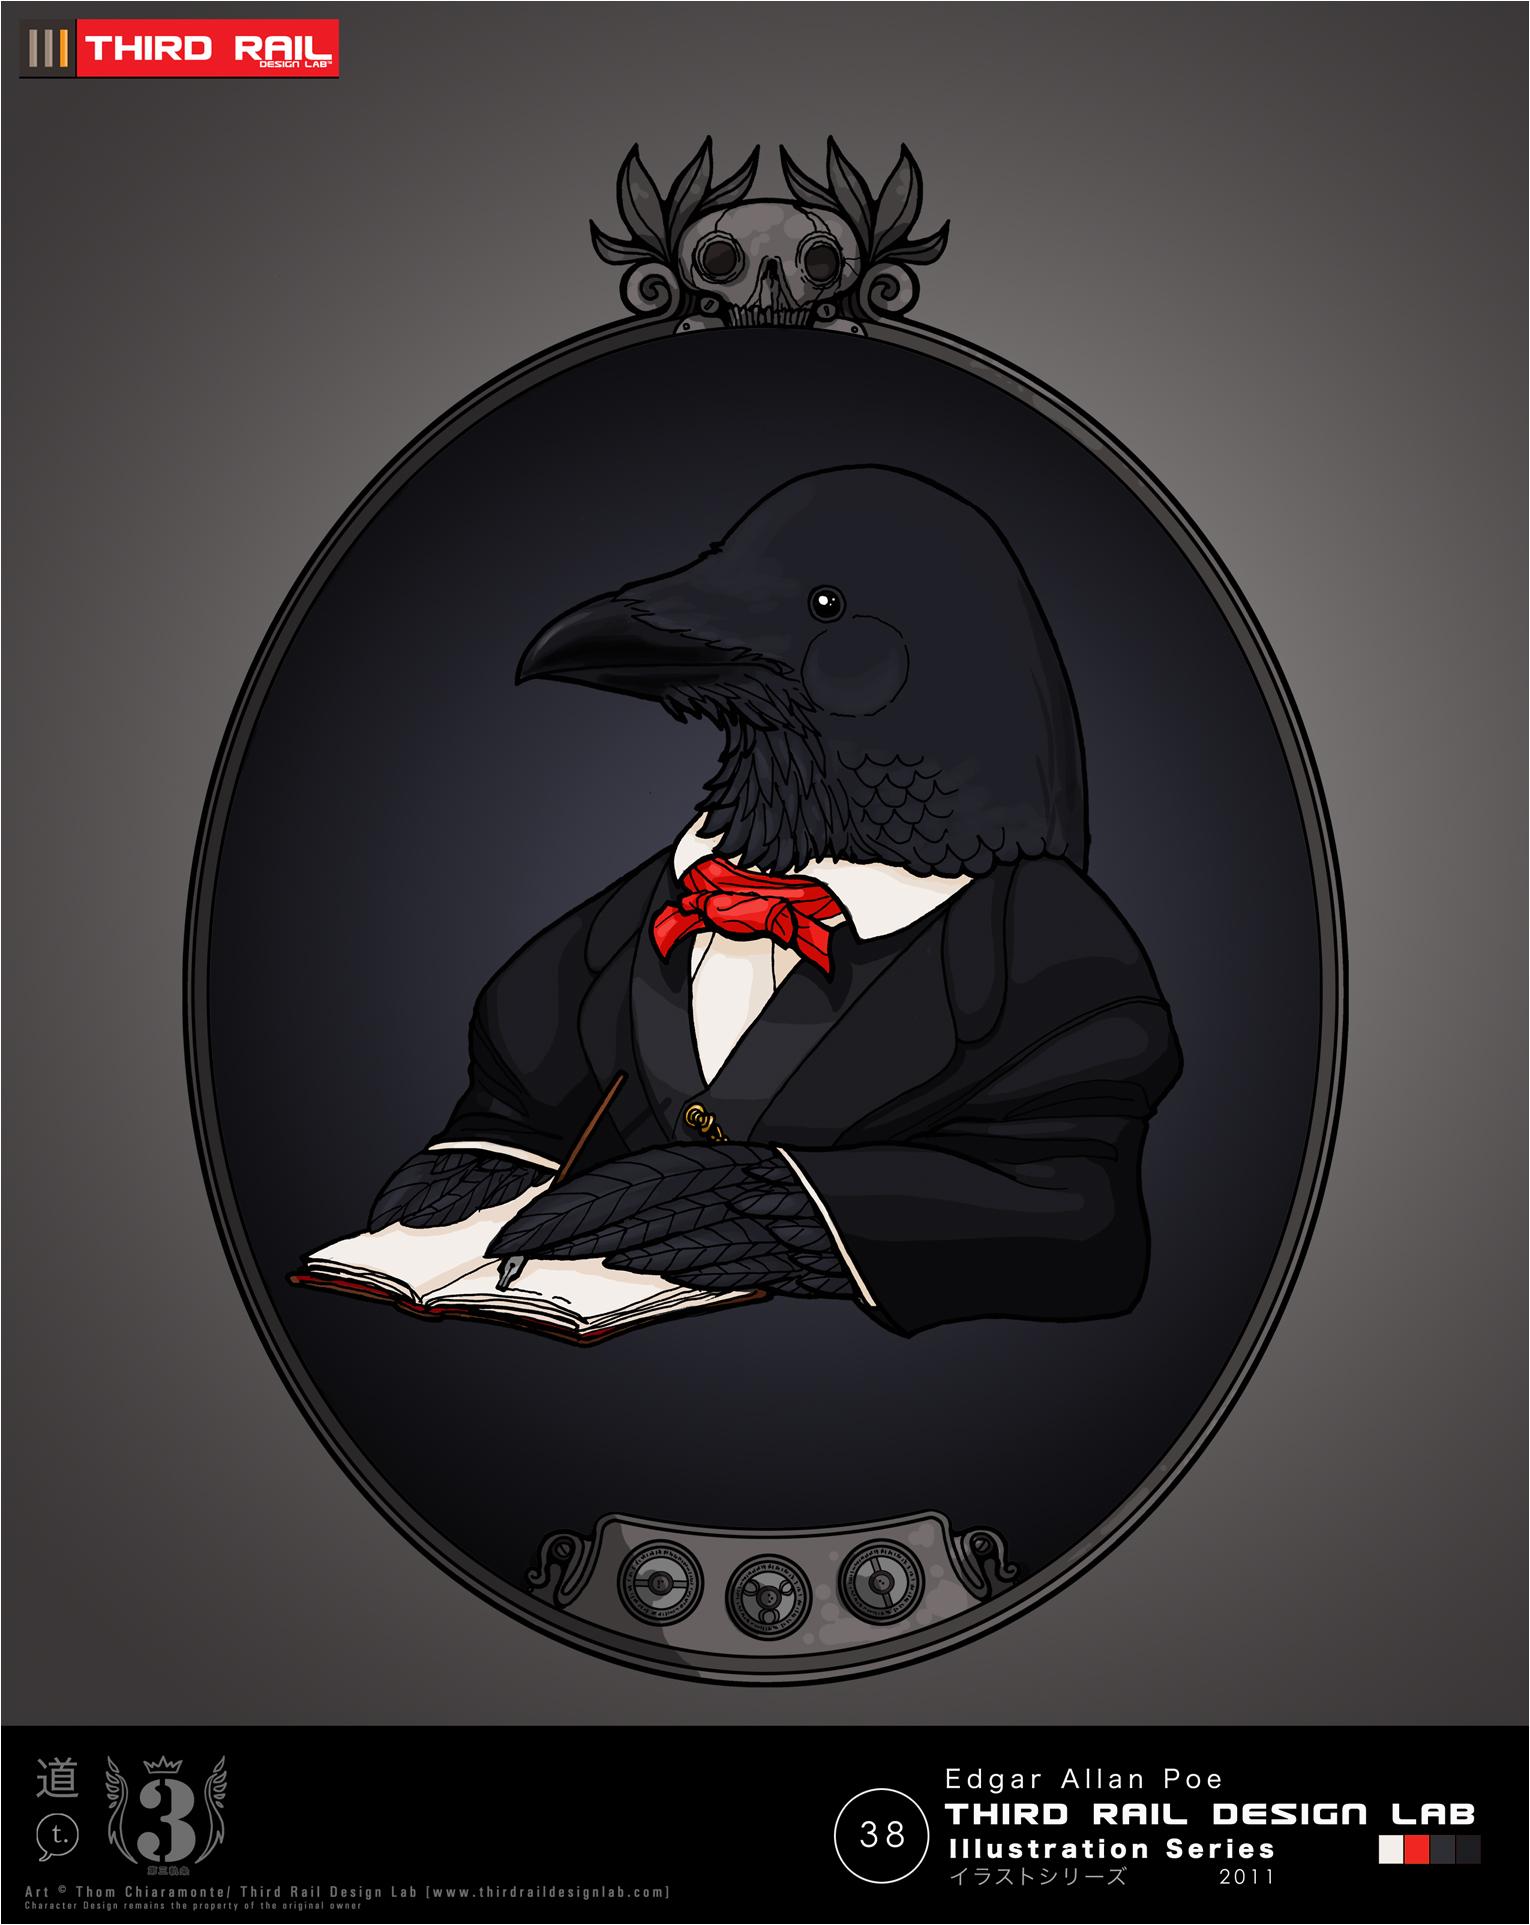 TRDL - Edgar Allan Poe by TRDLcomics on DeviantArt